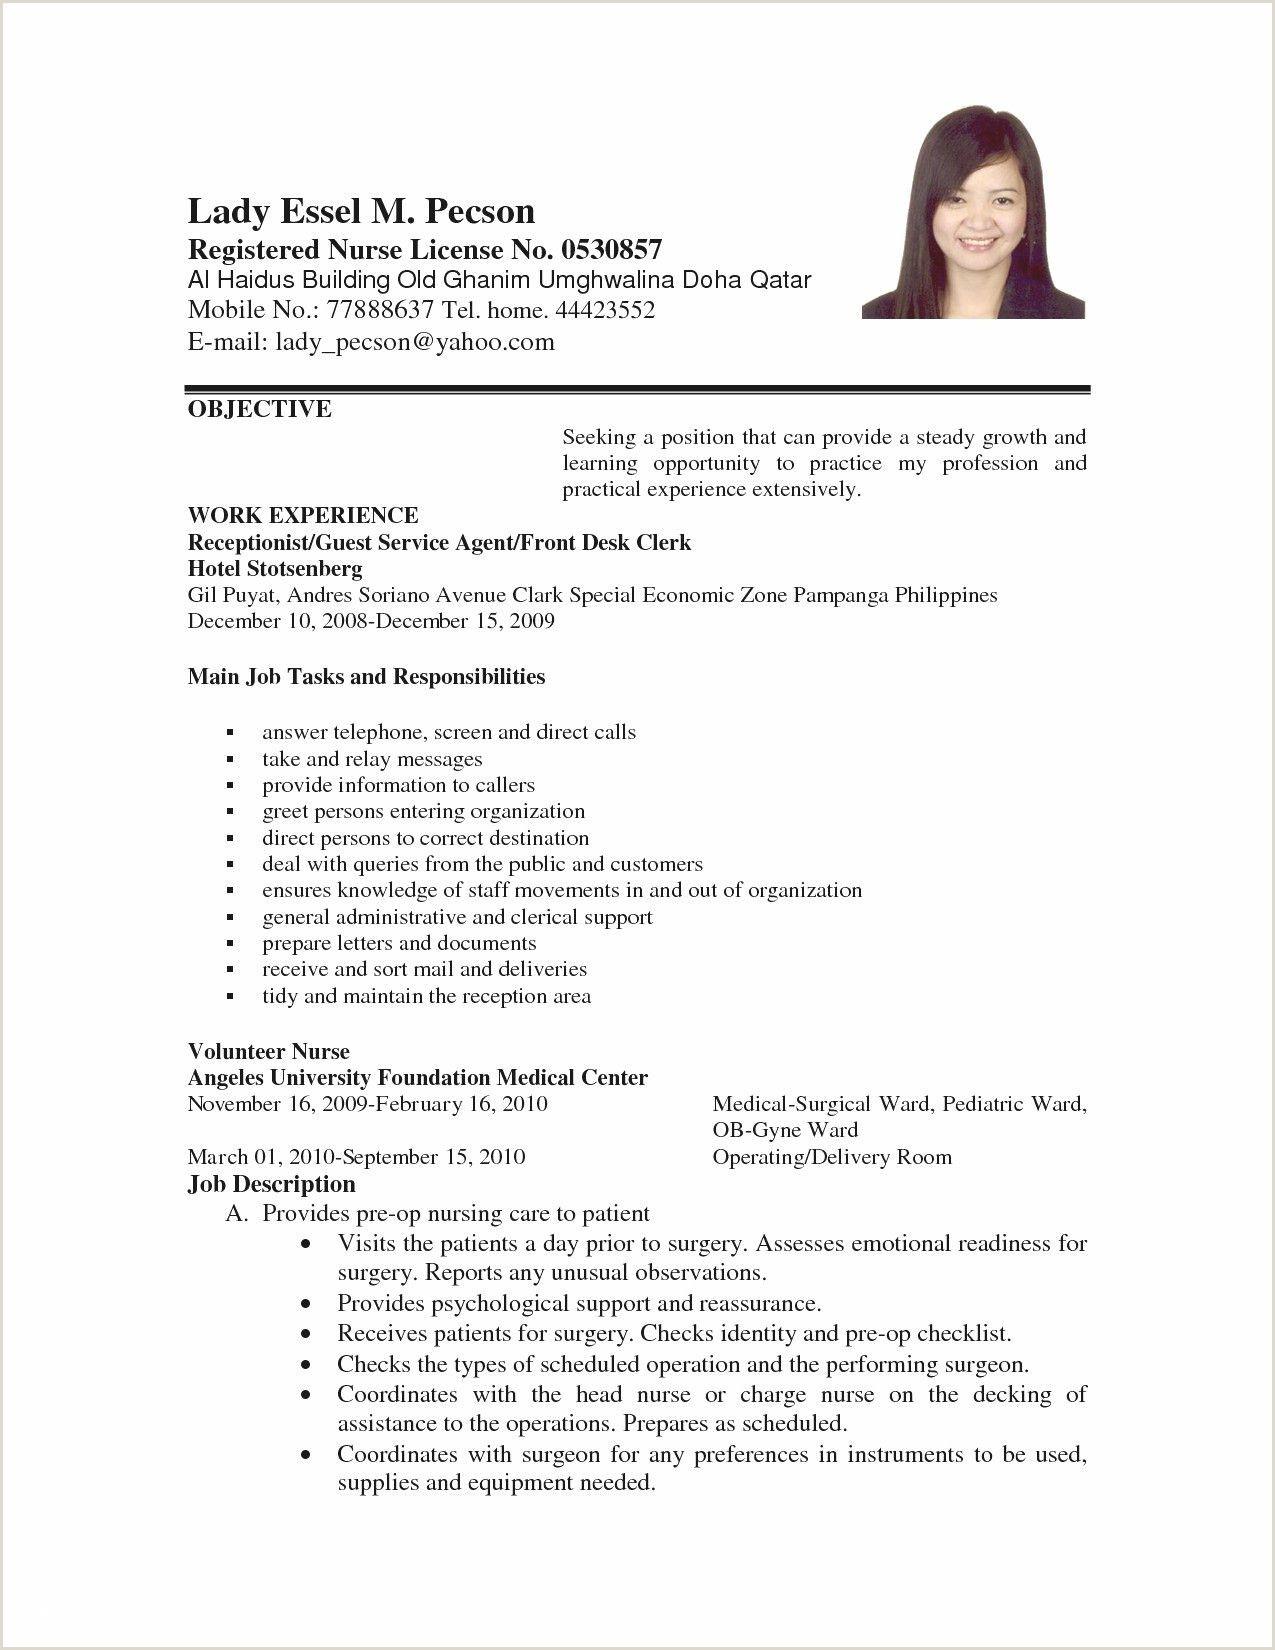 76 Elegant s Resume Examples for Call Center Jobs